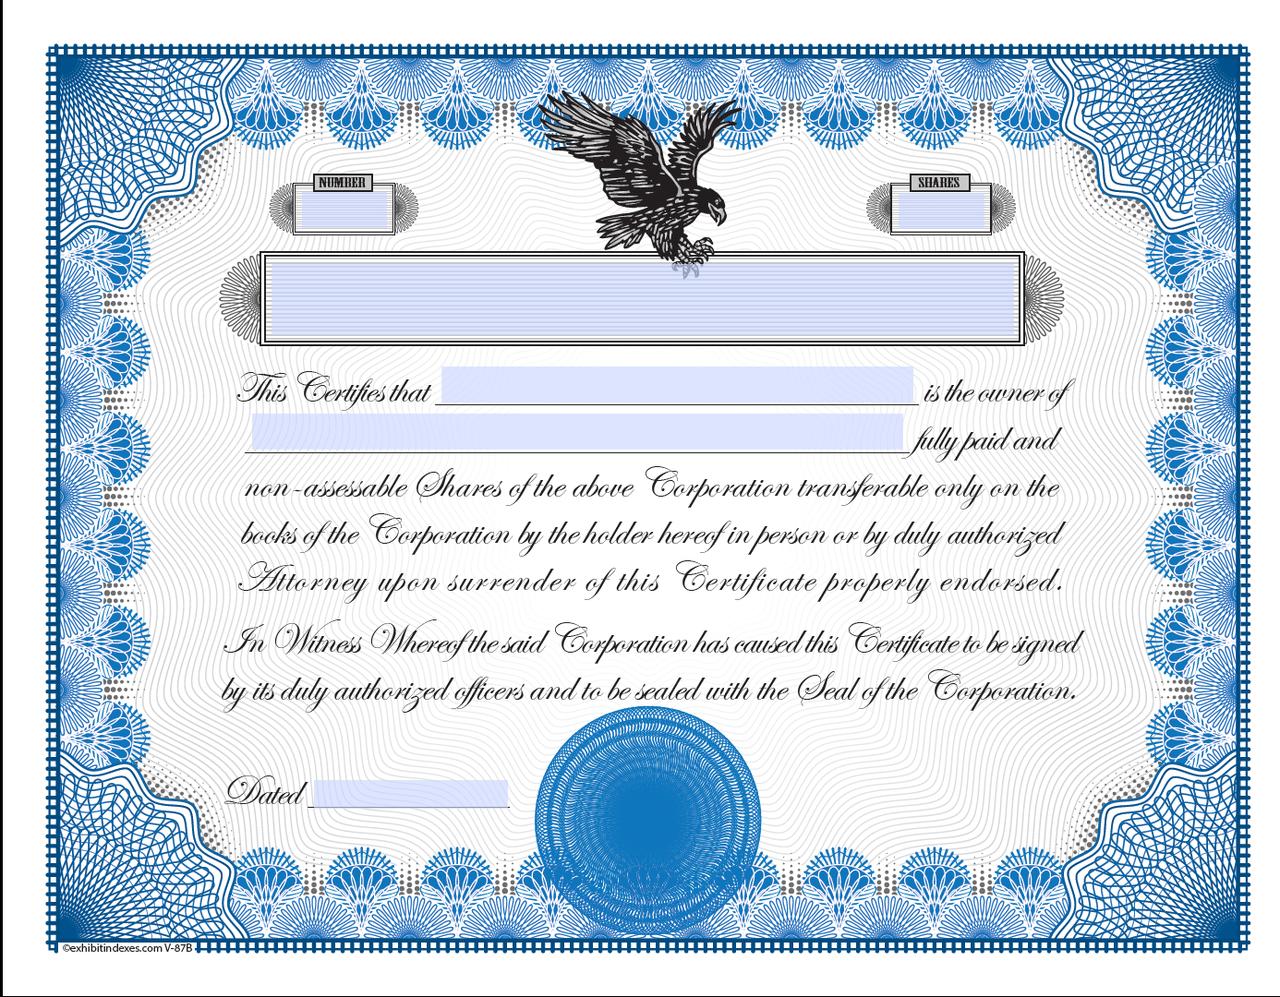 Printable Stock Certificates Exhibitindexes